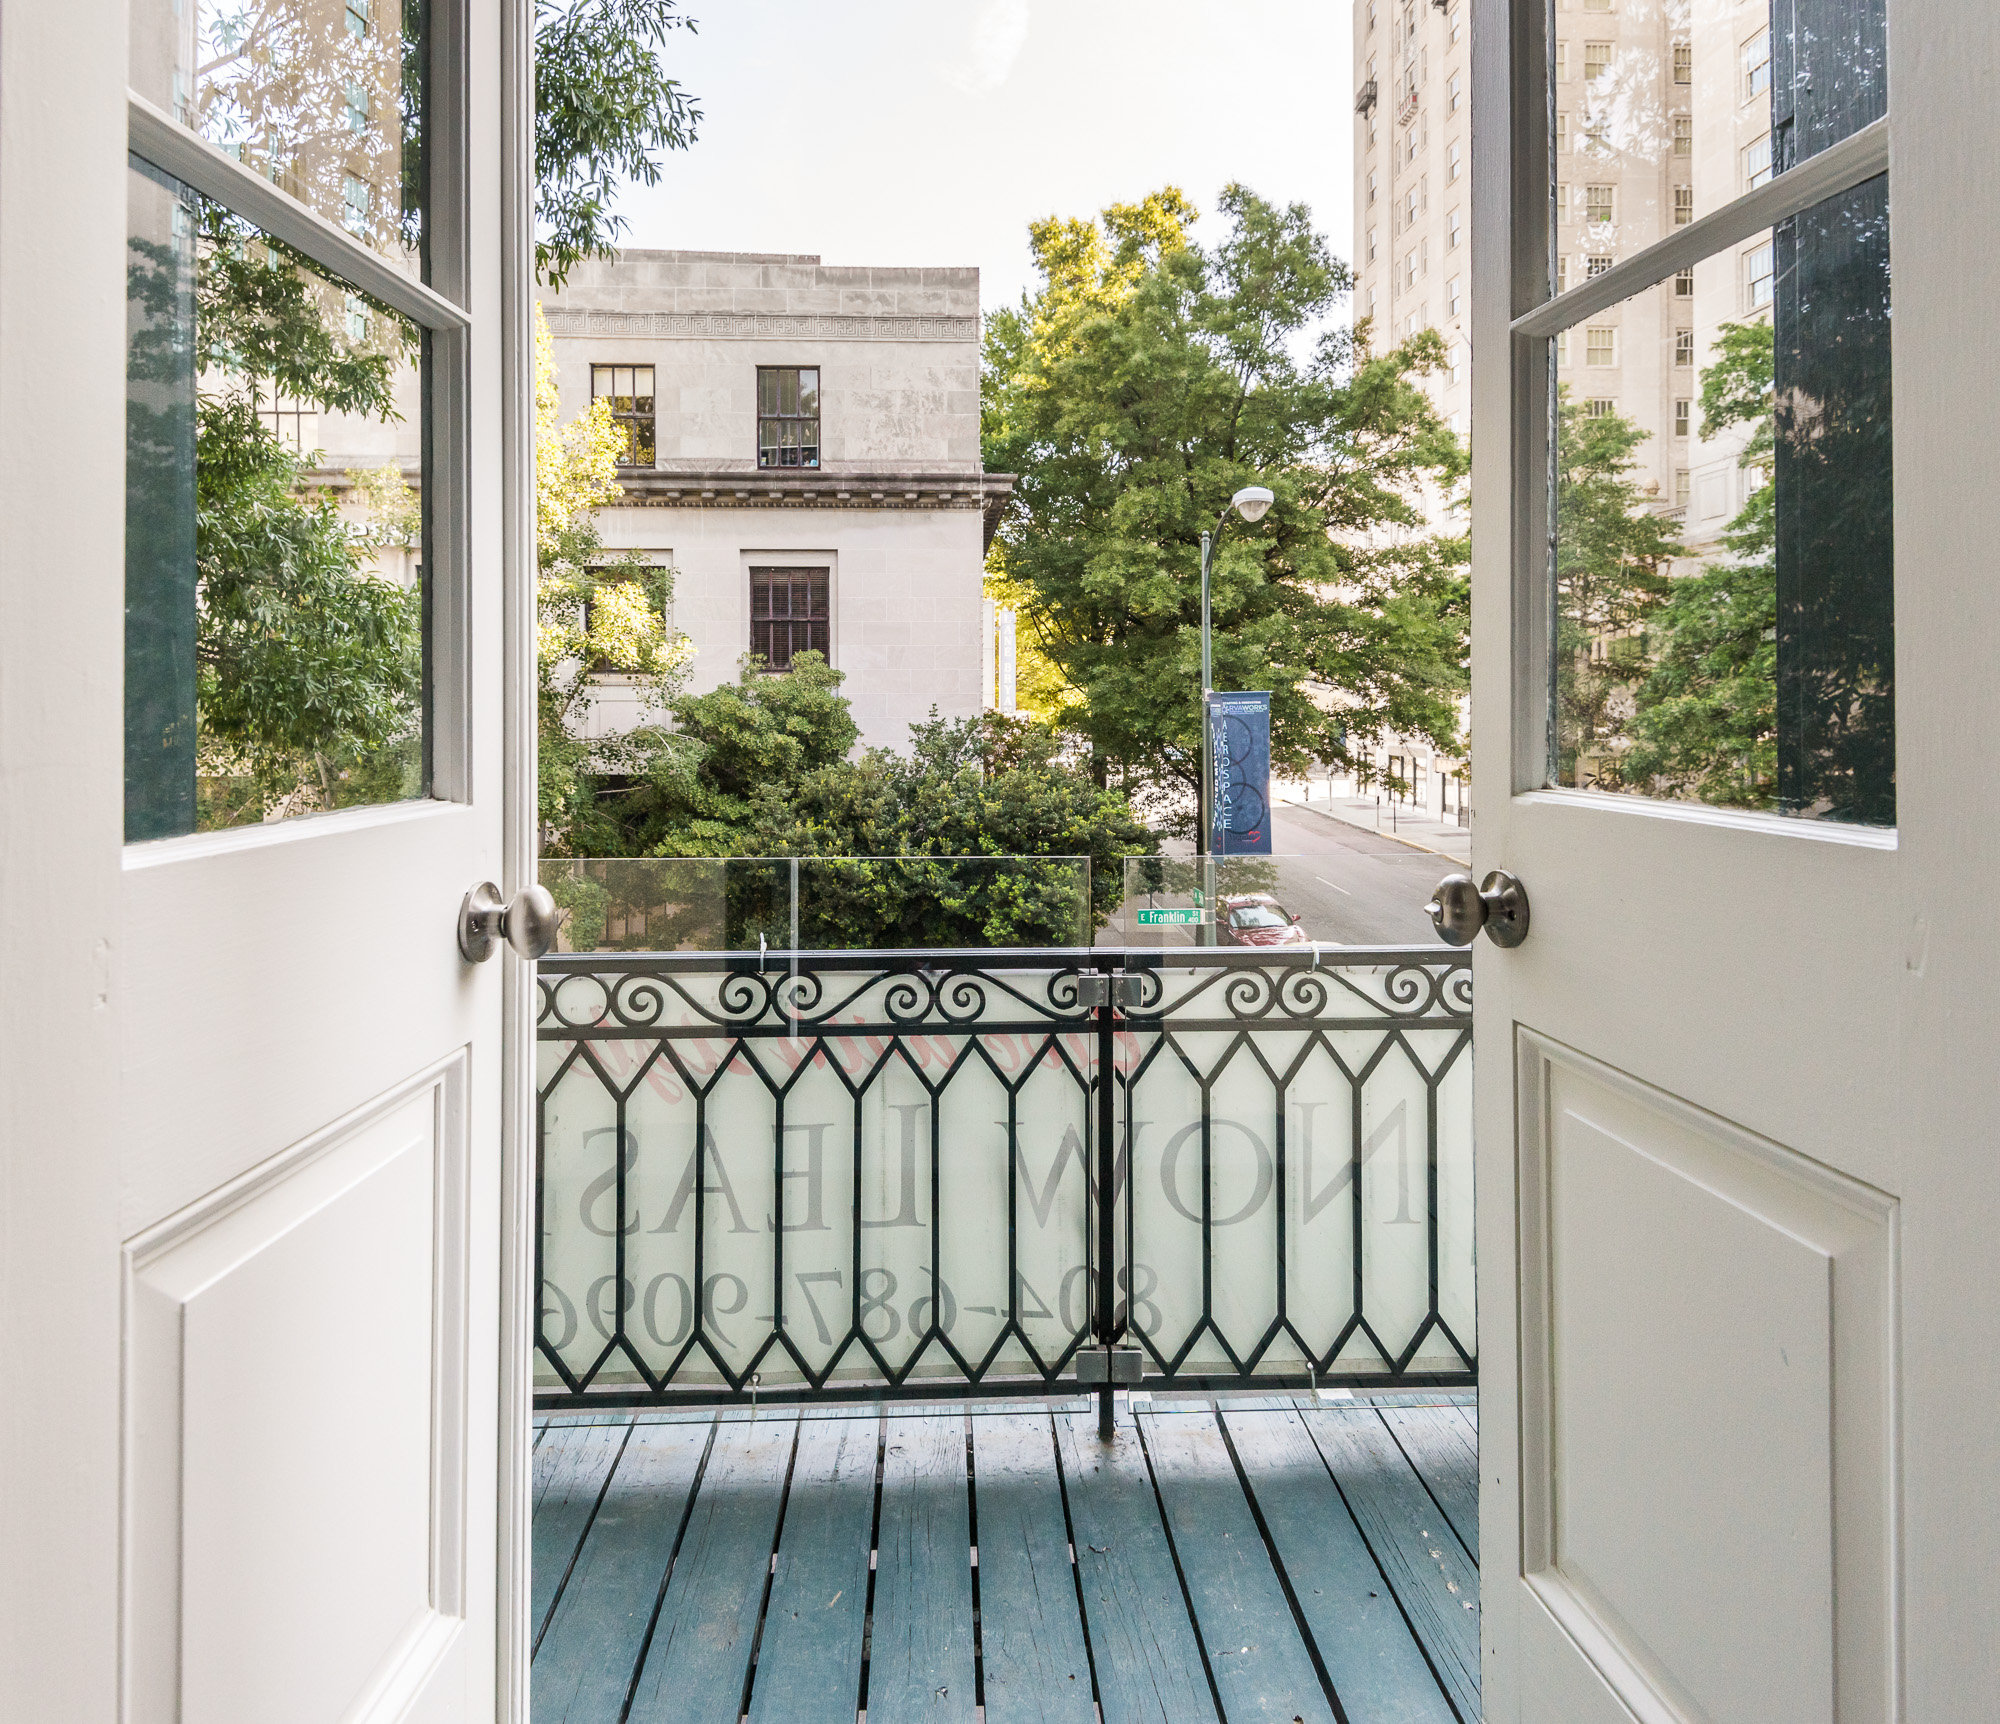 2A Balcony Doors.jpg